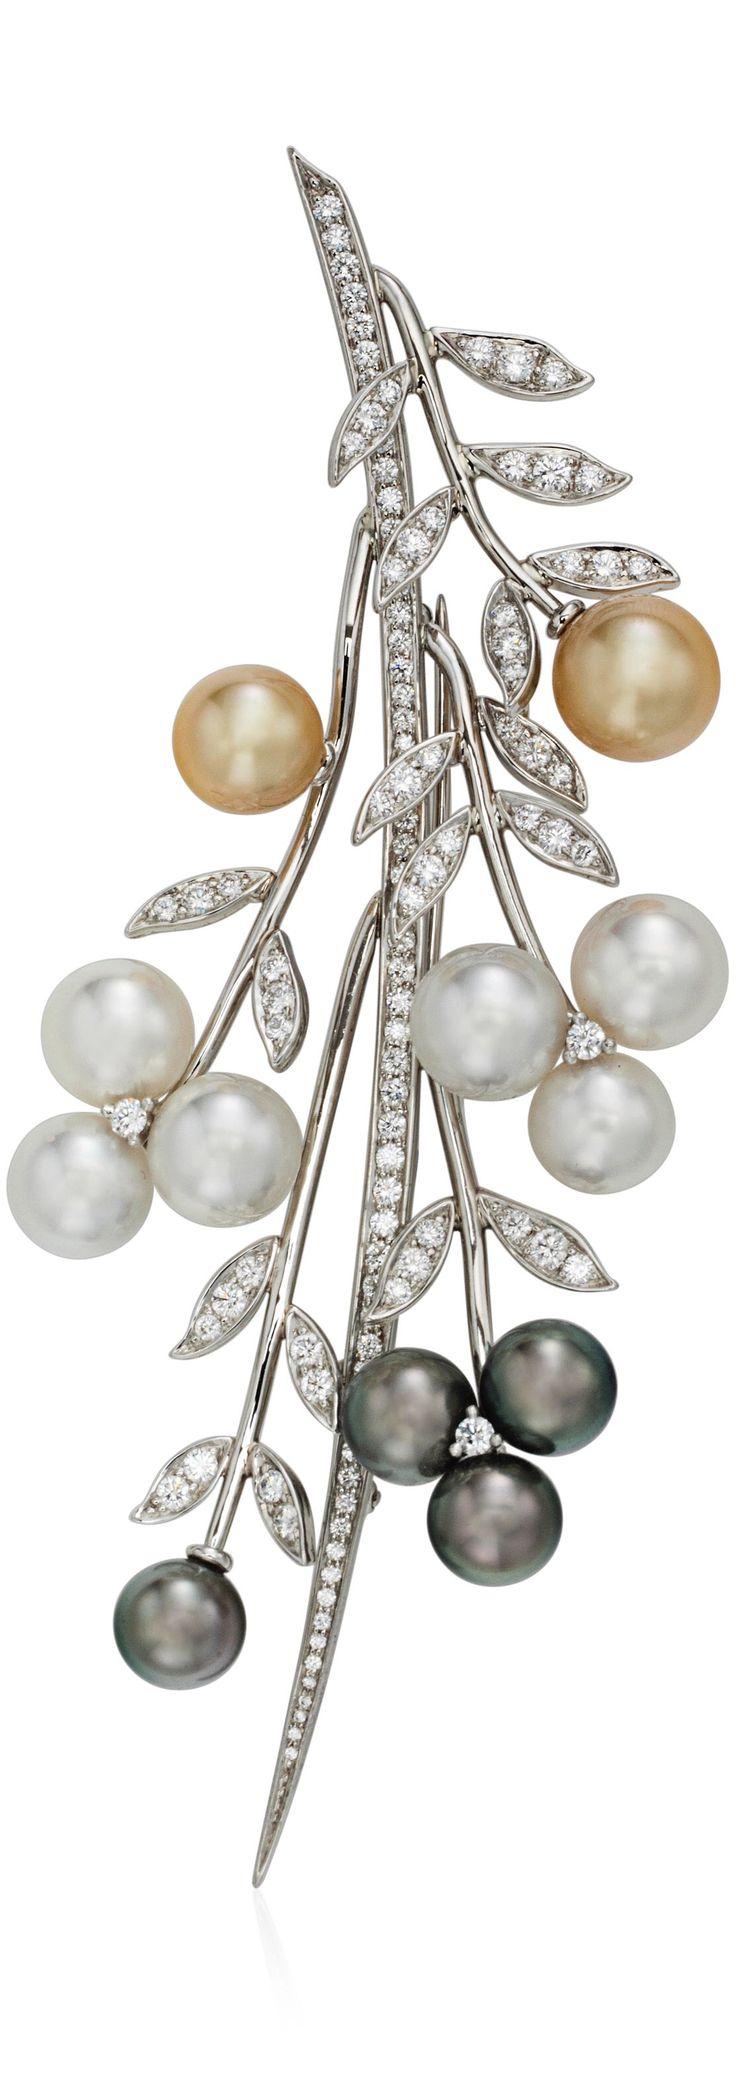 {TIFFANY & CO. CULTURED PEARL AND DIAMOND FOLIATE BROOCH, via Christie's Jewels Online} ❤️HT